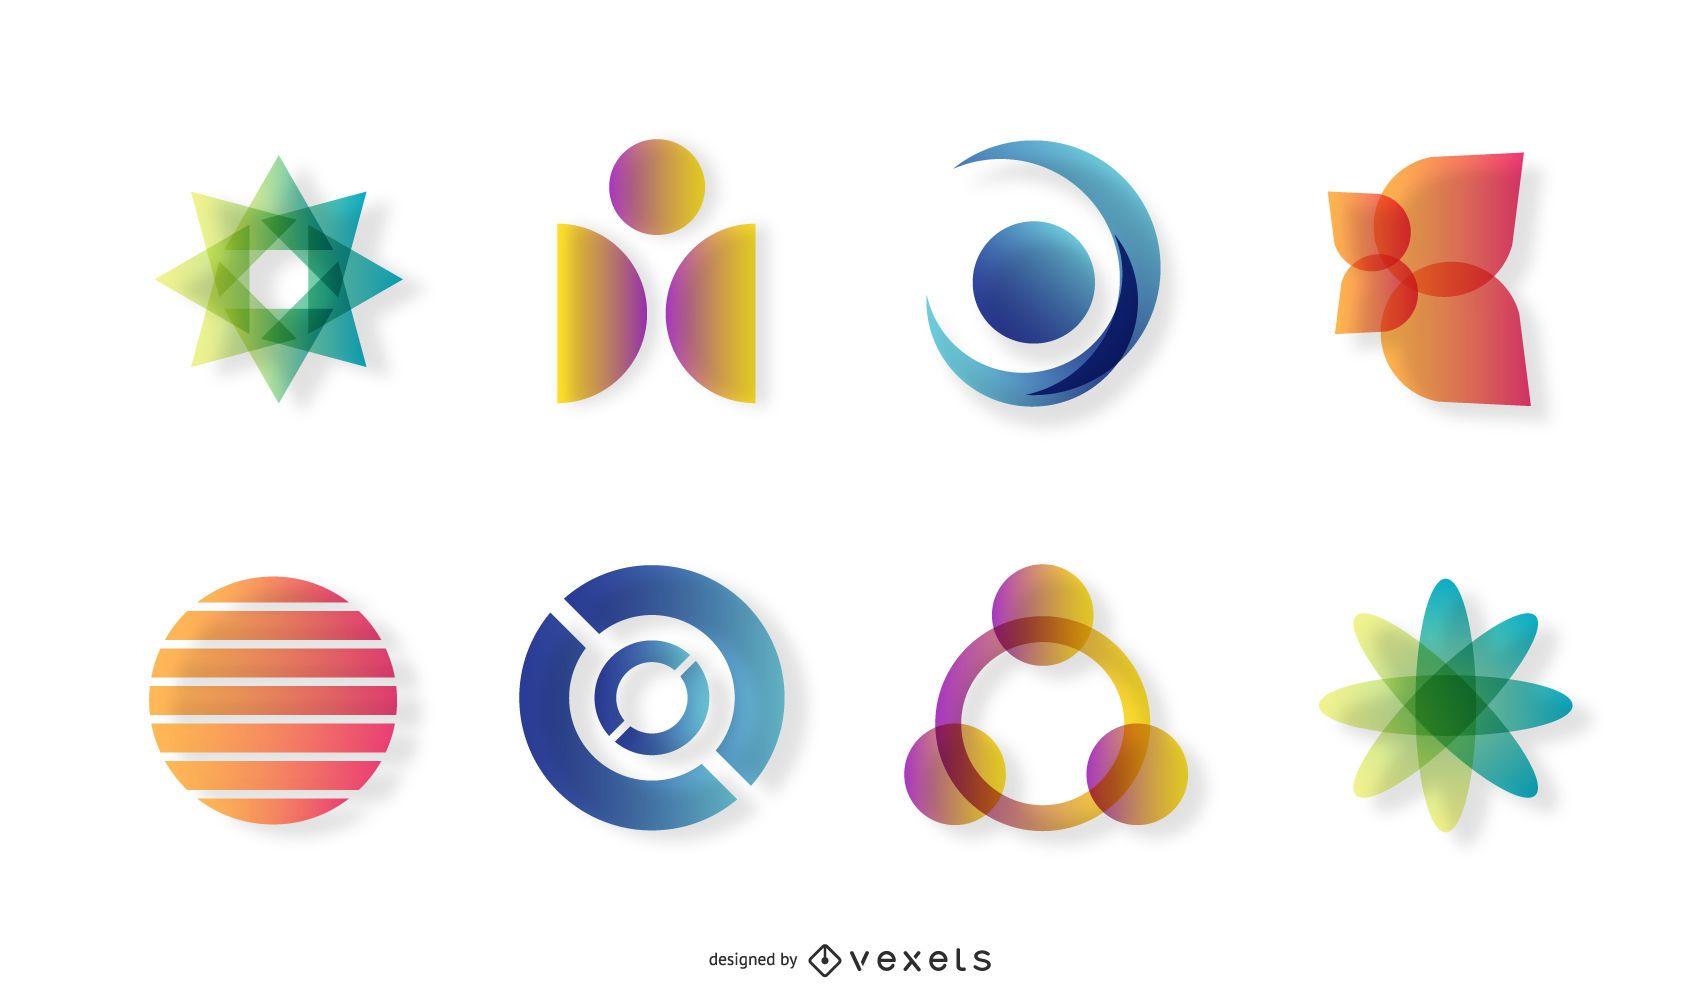 Logotipos de cores diferentes